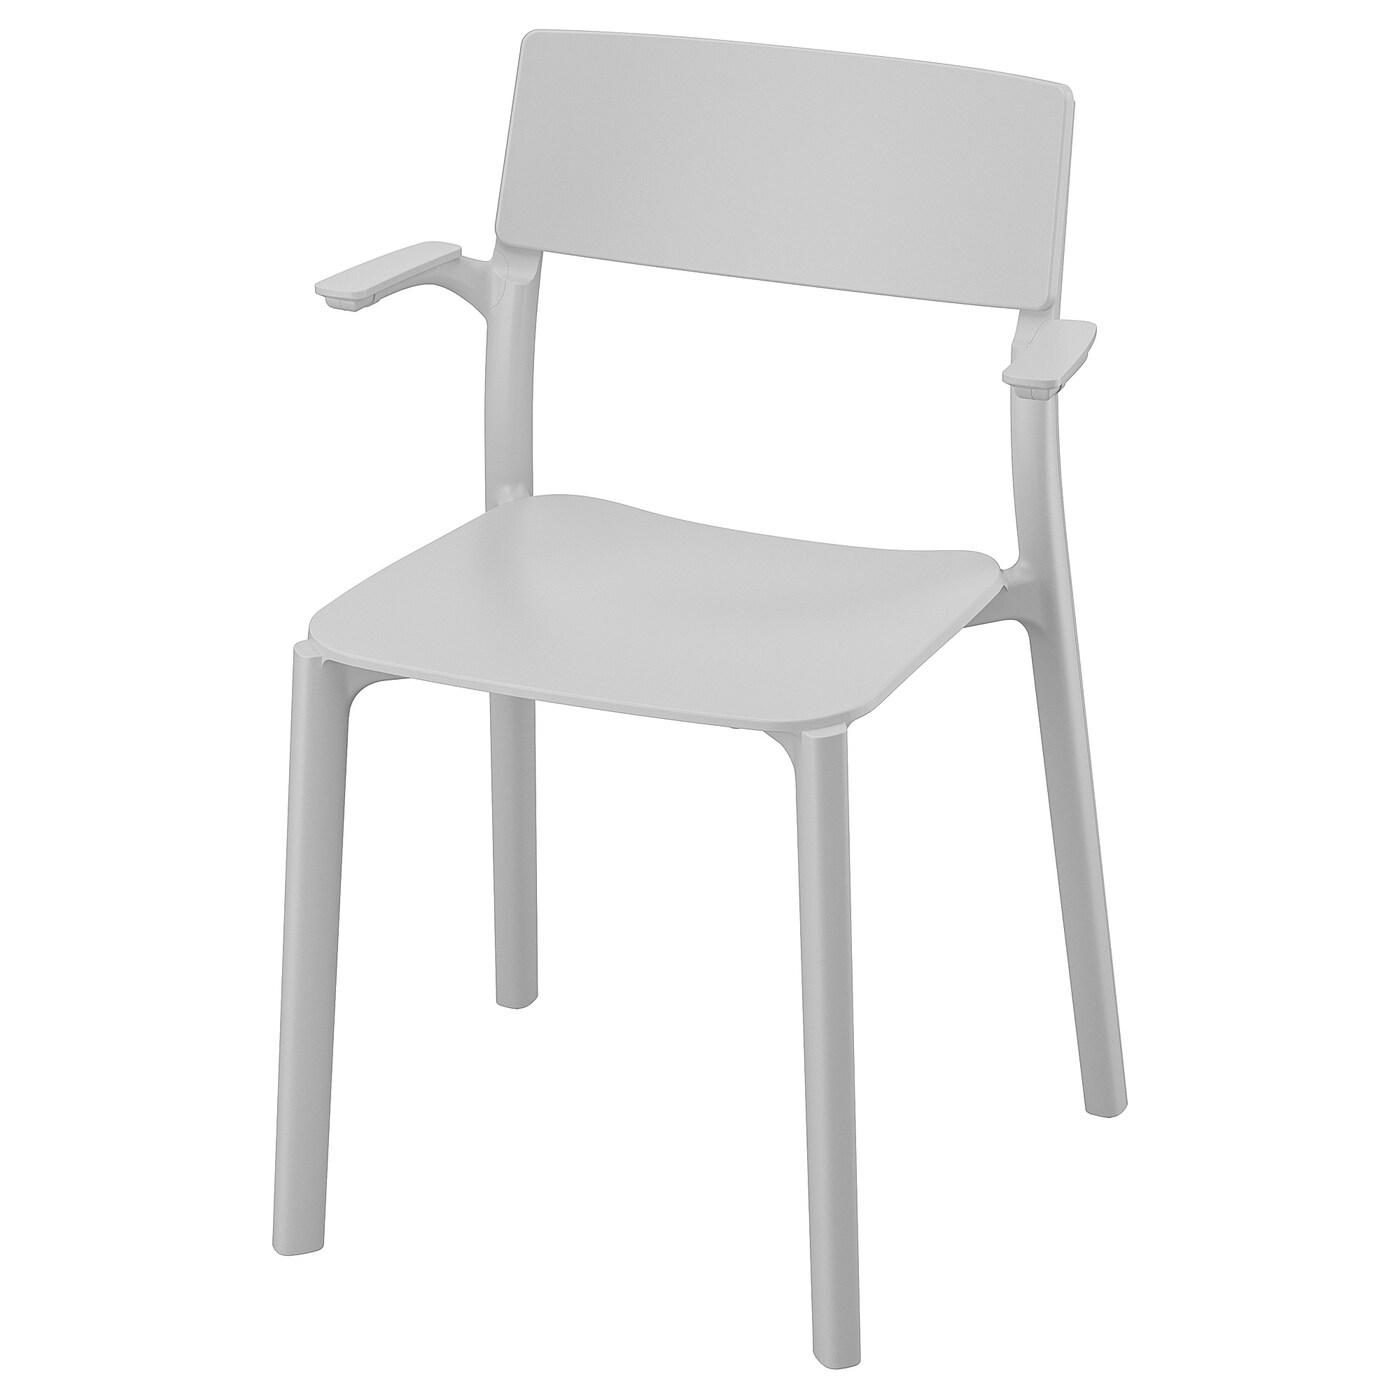 JANINGE Chaise à accoudoirs, gris IKEA